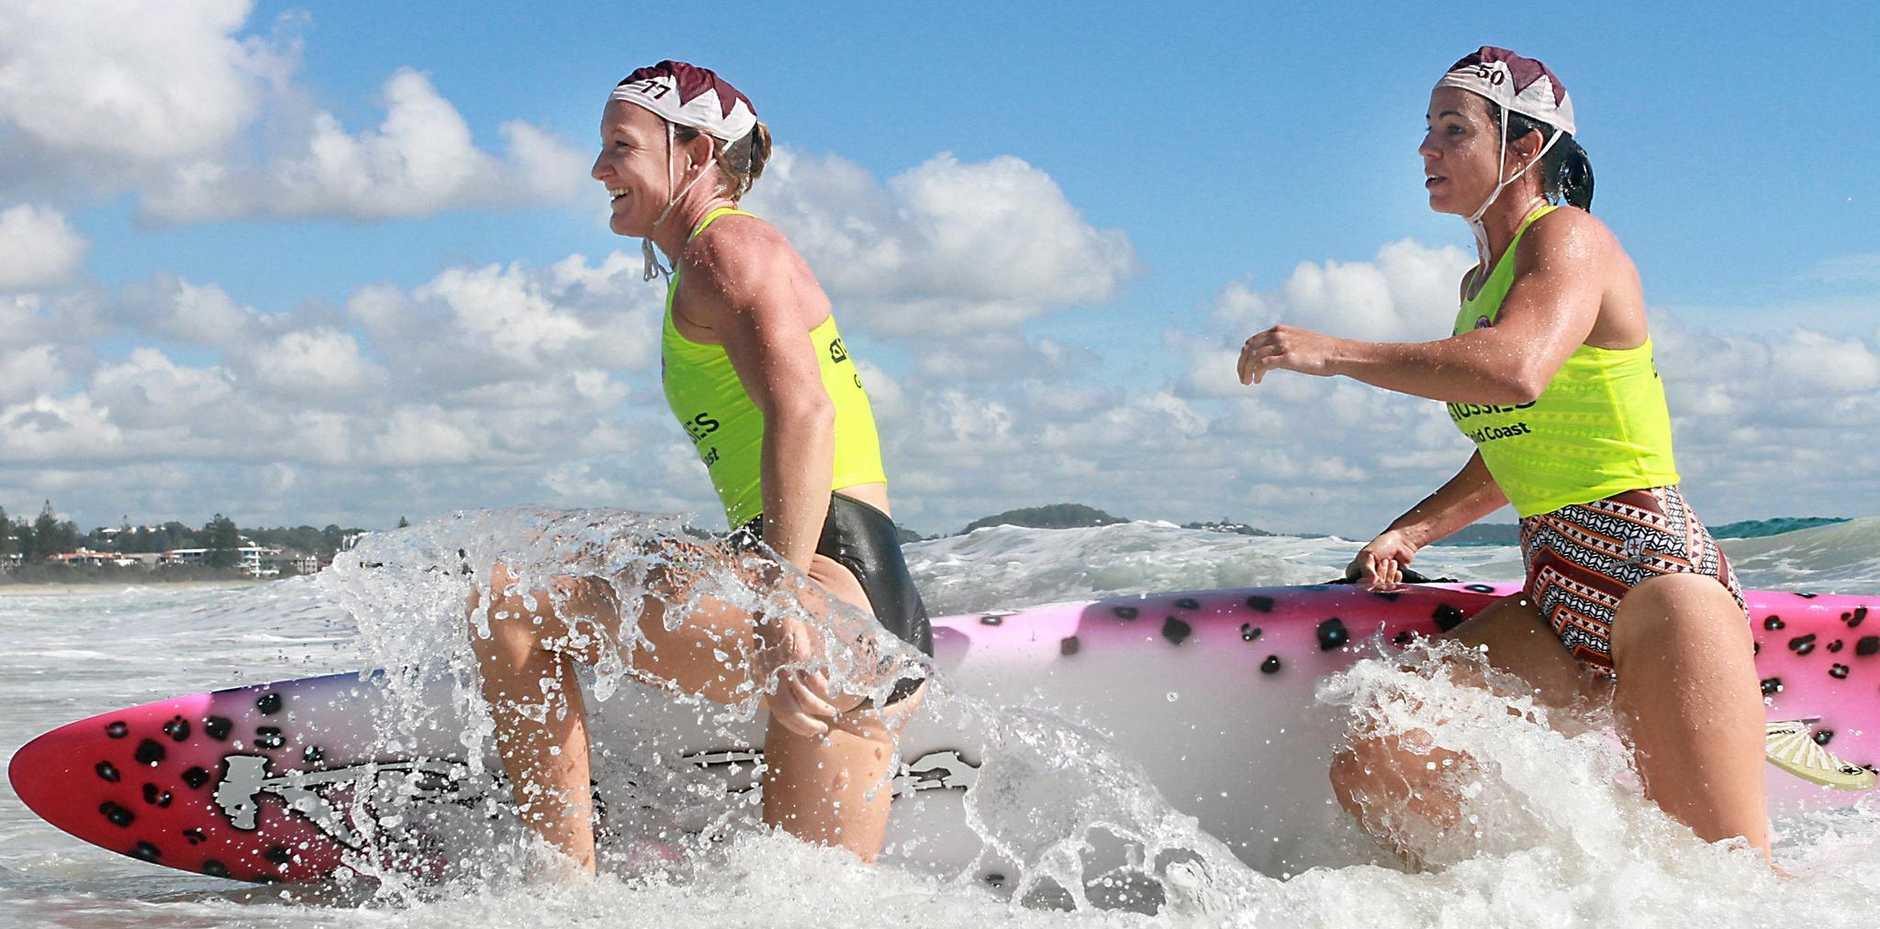 IN THE WATER: Krystl Smith and Lee Vrolyks in action last week.